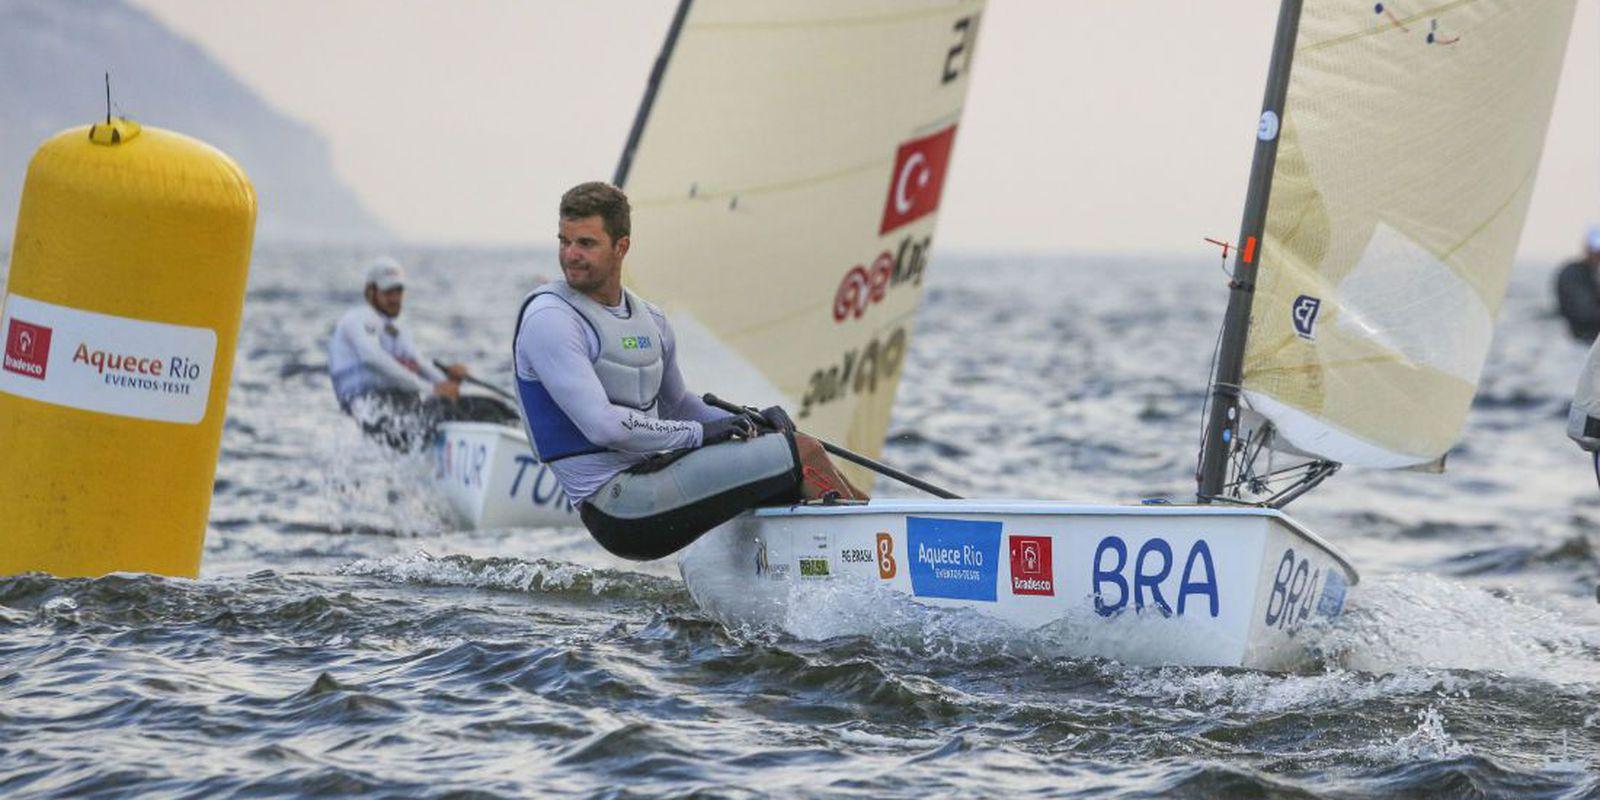 Sailor Jorge Zarif entered the top 10 European Championships in Portugal